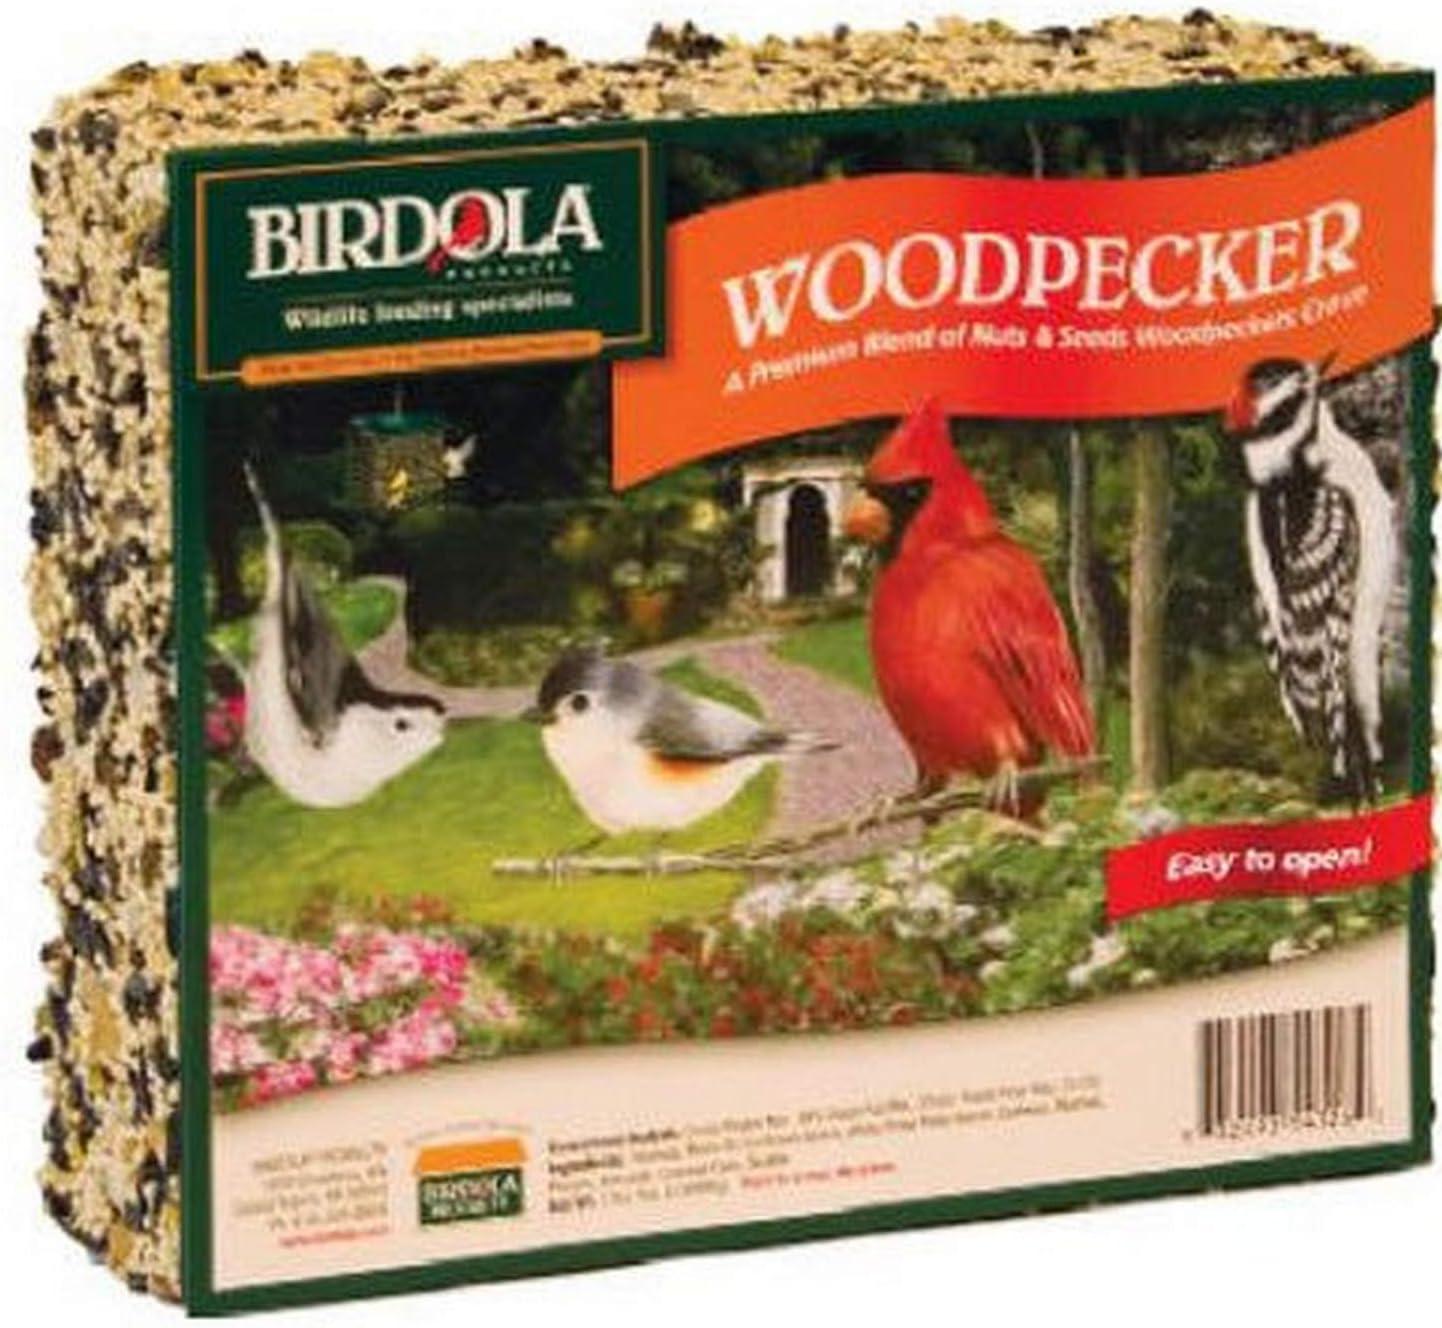 Birdola 54328 Woodpecker Seed Cake, 2 pound